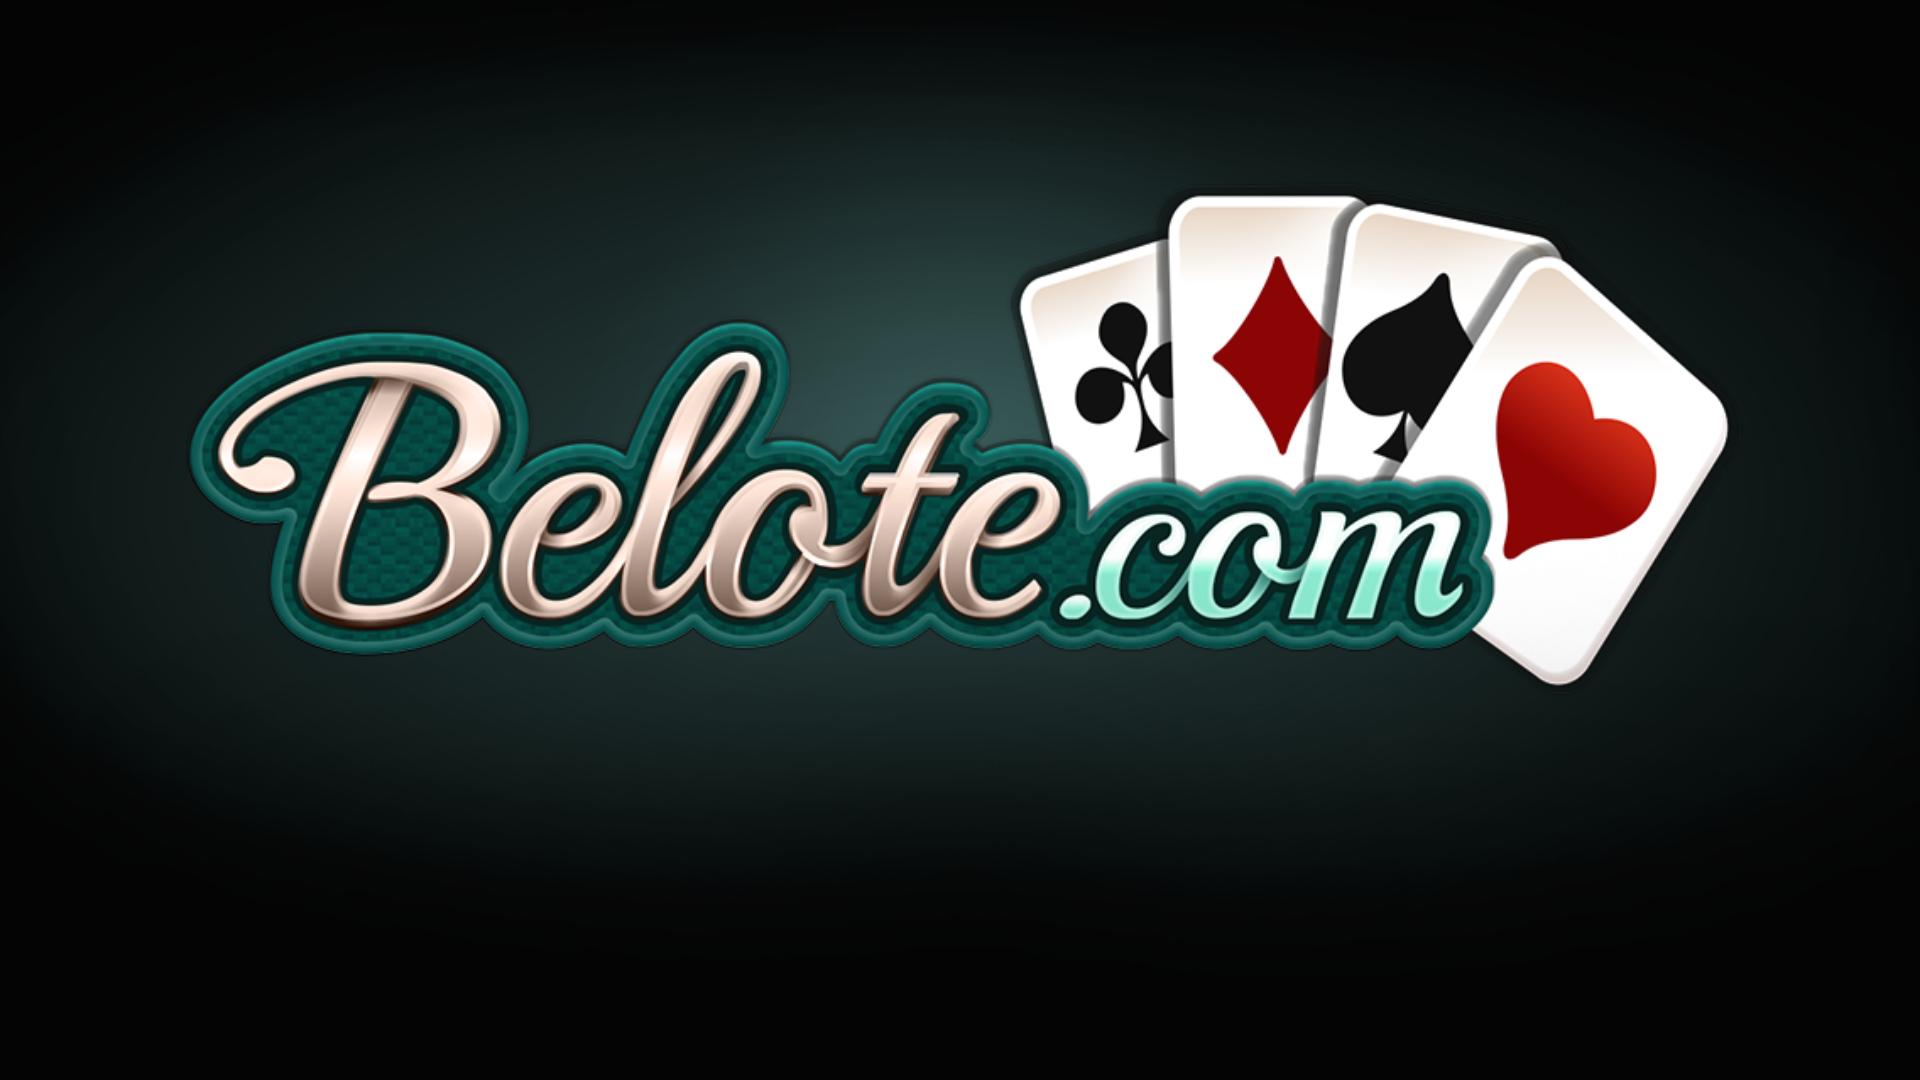 jeu belote coinche gratuit